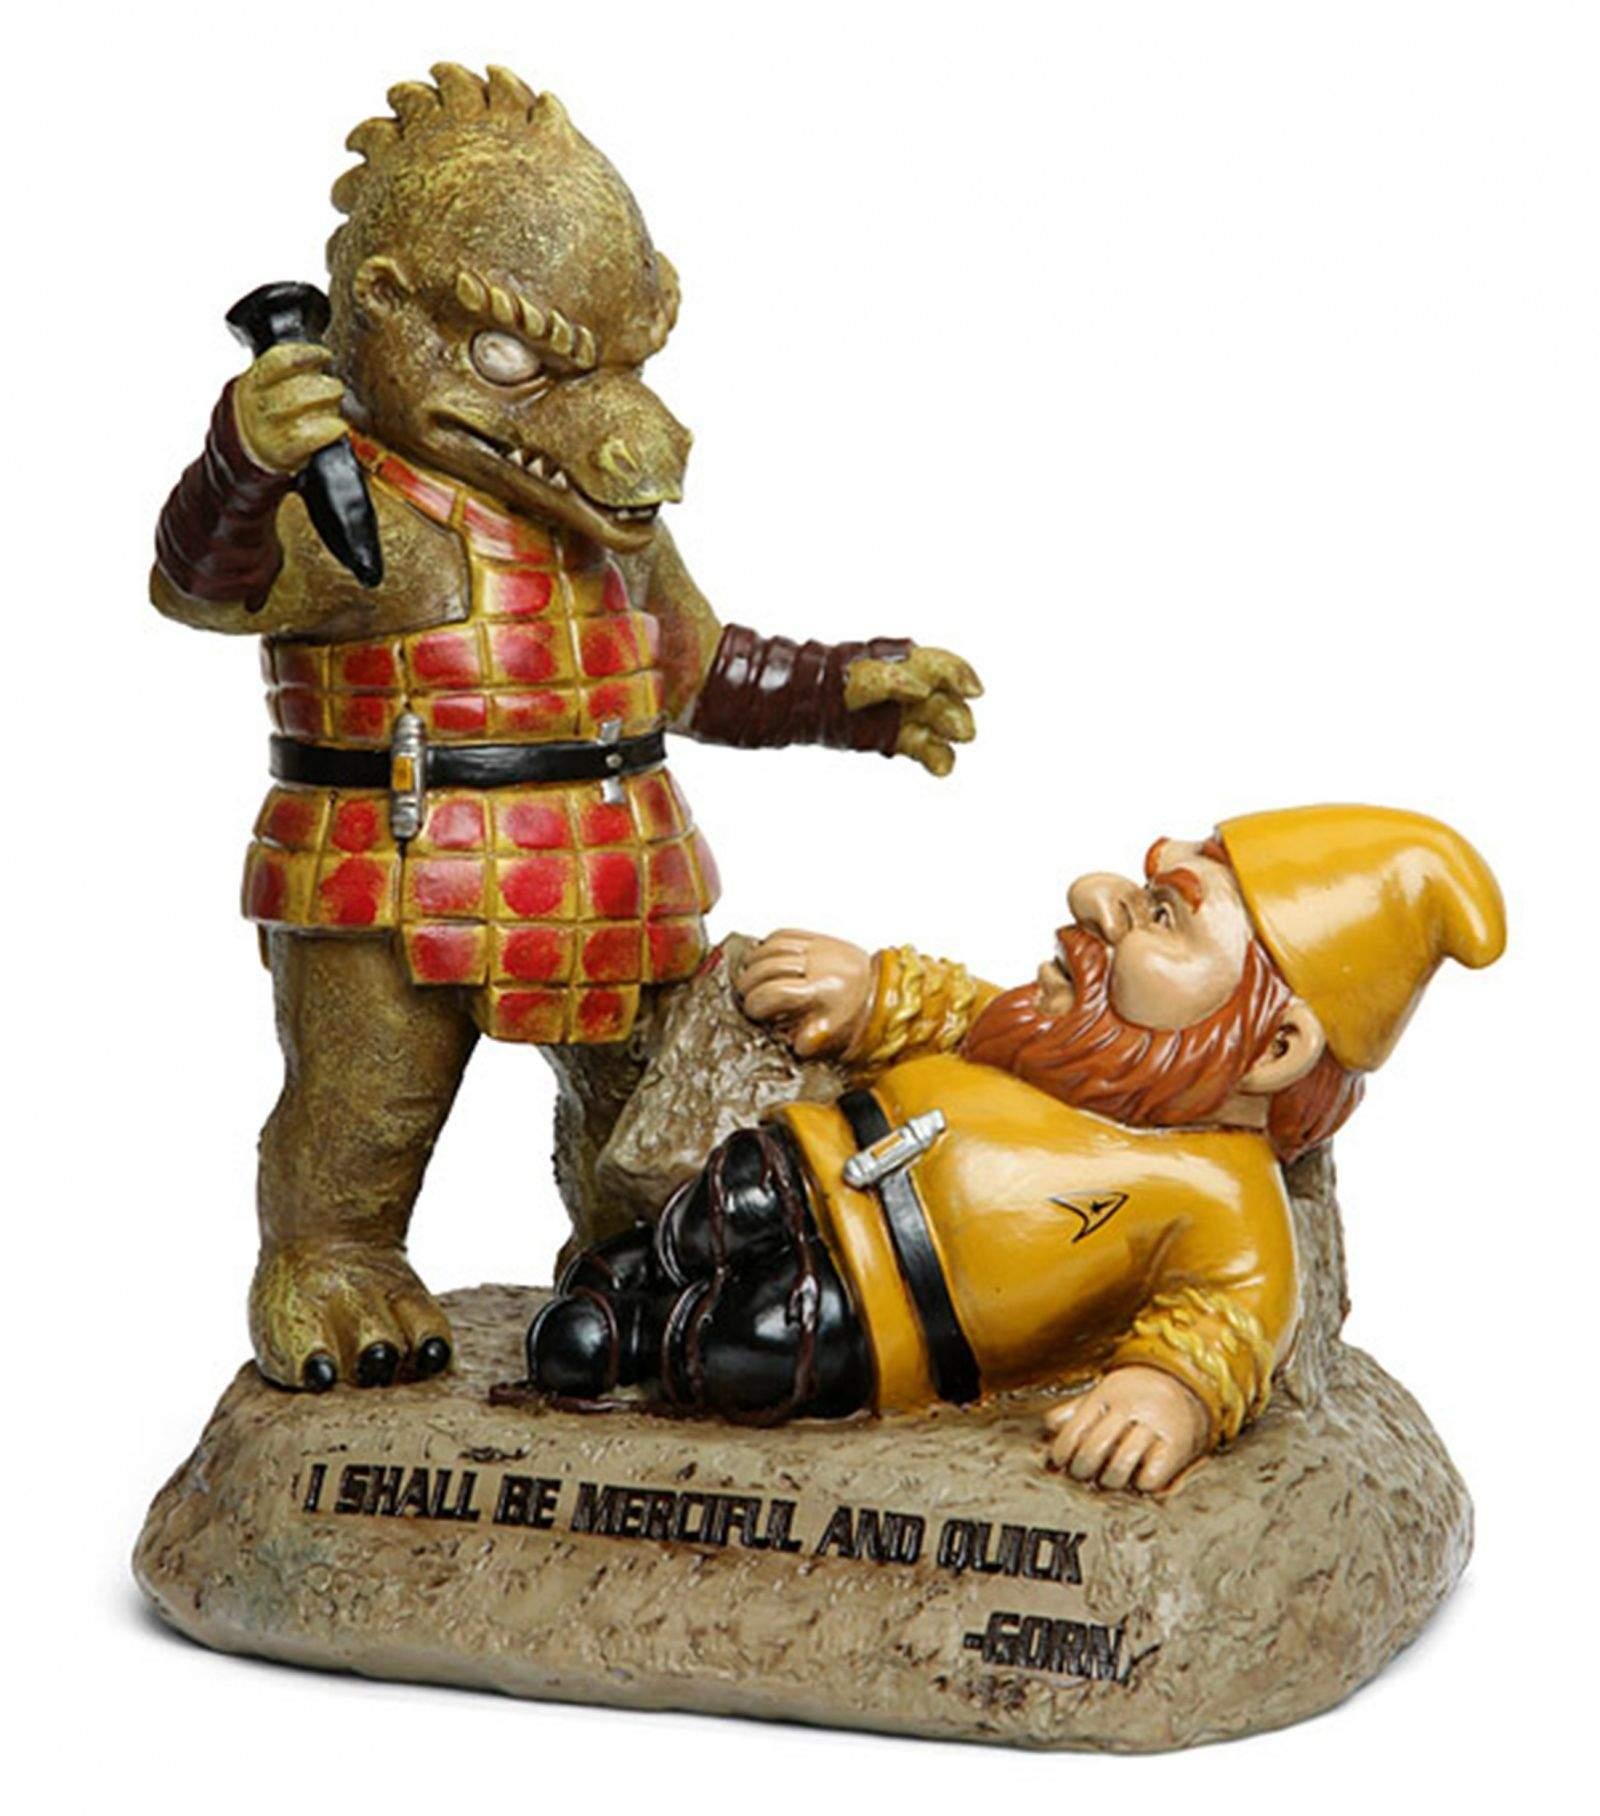 Star Trek garden gnomes should boldly go in your back yard